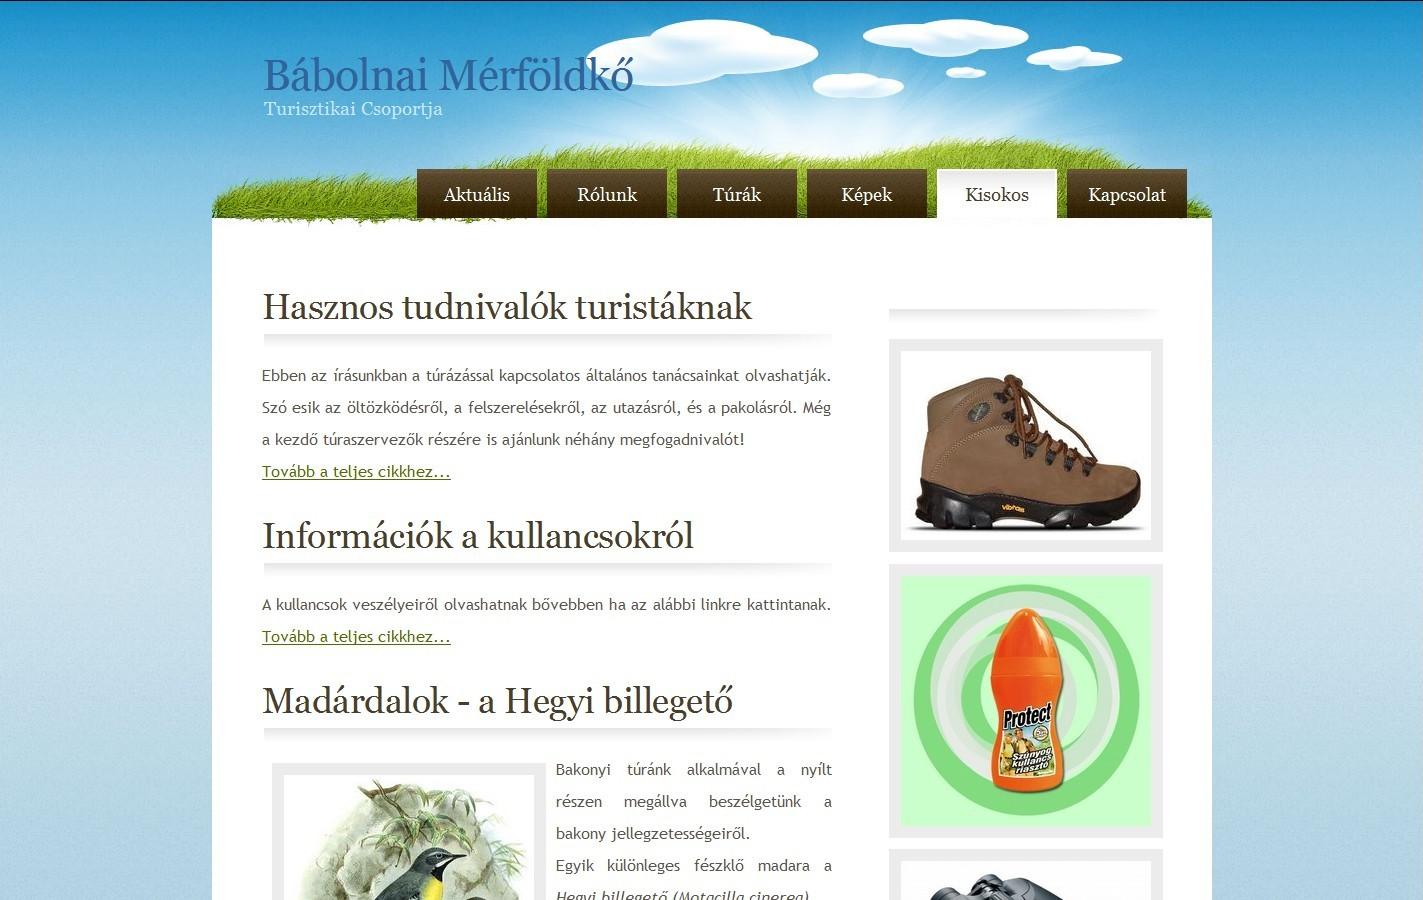 merfoldko_babolna_hu